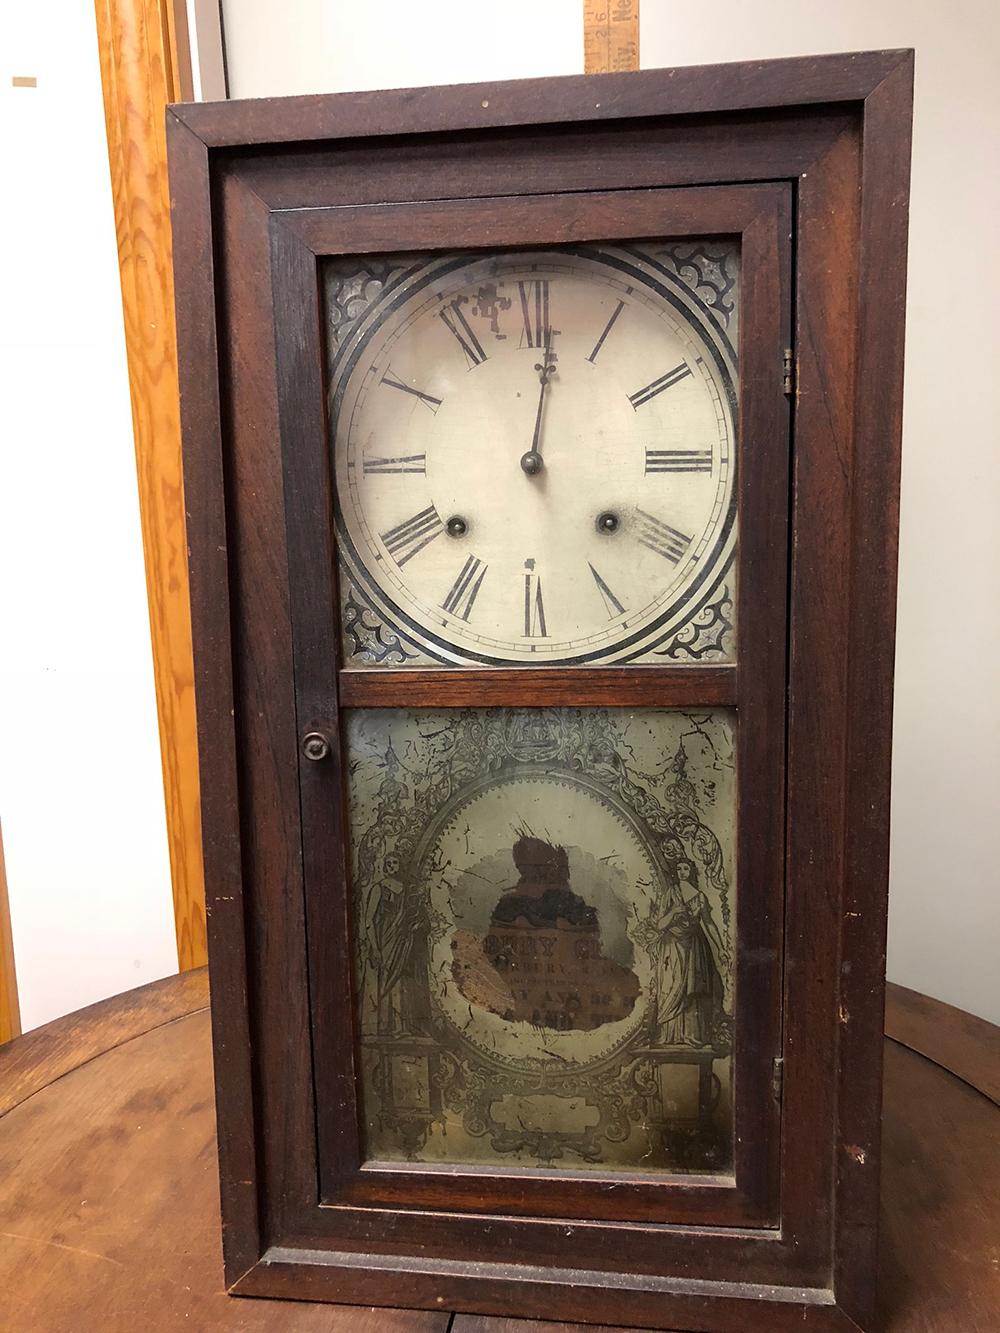 Waterbury Clock Co. Cased Clock